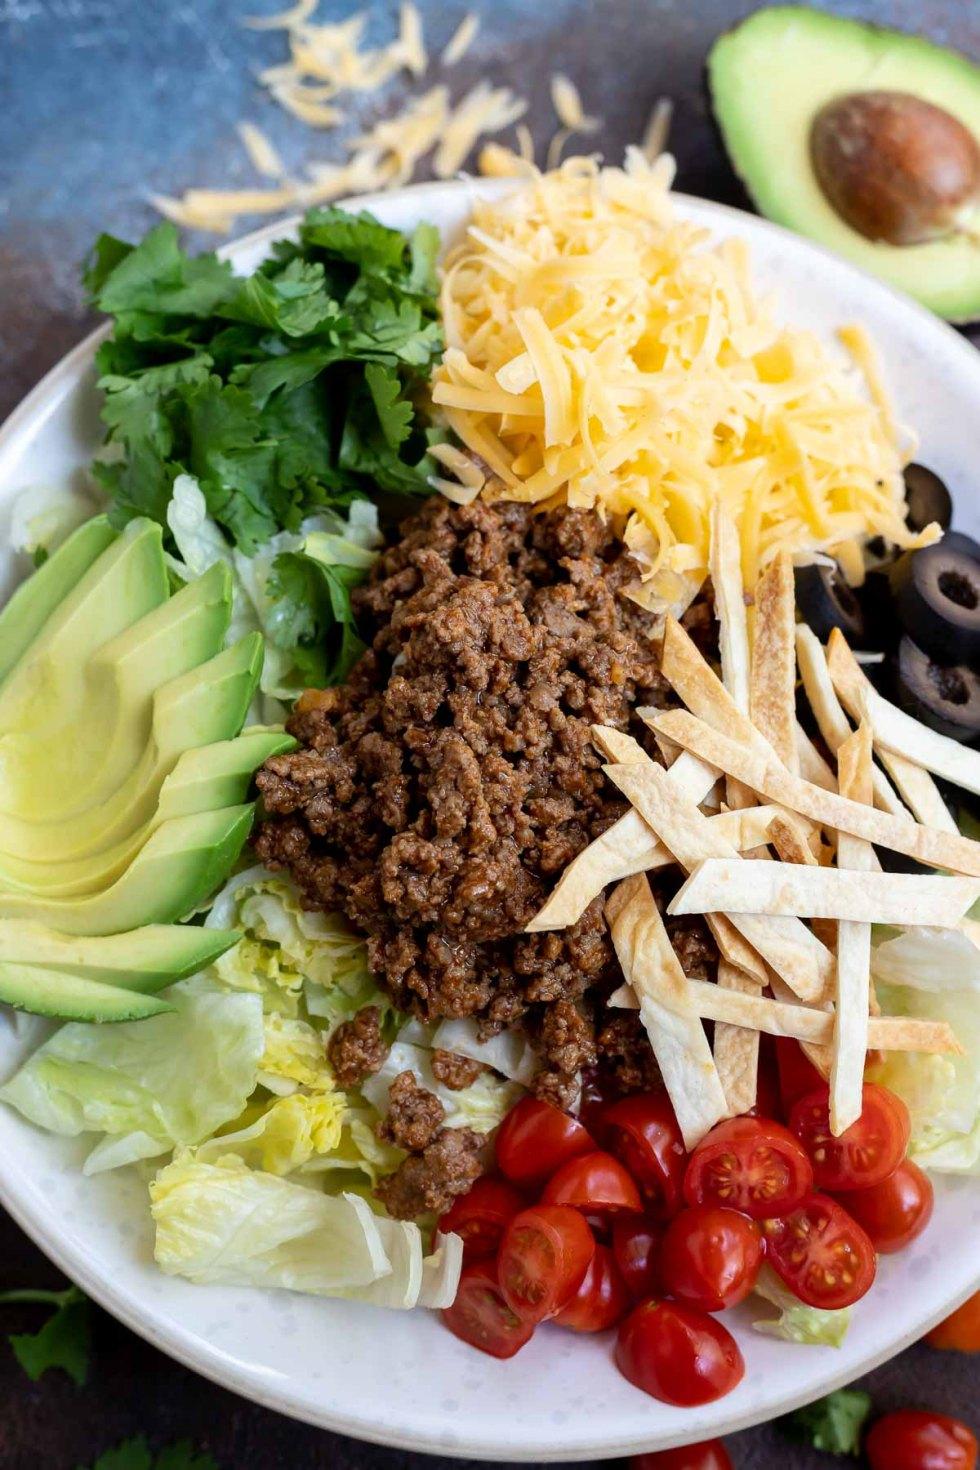 taco salad ingredients not yet mixed